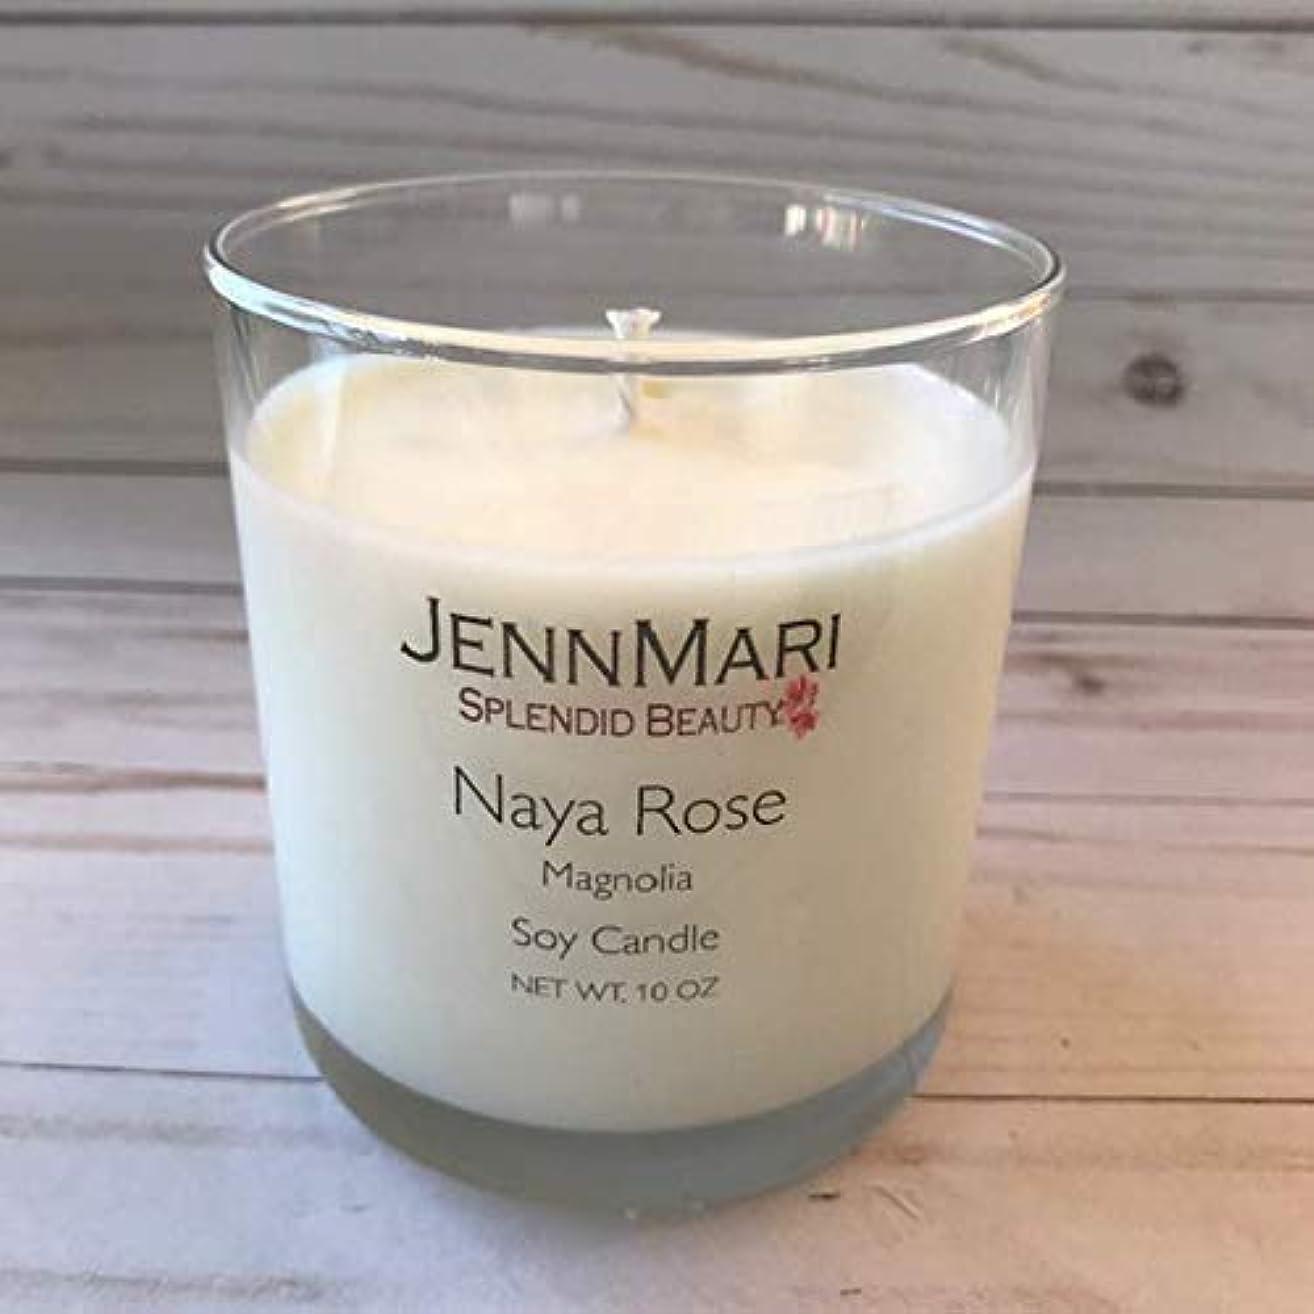 Splendid Beauty   Magnolia Scented Soy Candle Glass Jar   10 Oz   Handmade   Eco-friendly   Vegan   Cotton Wick   100% Soy Wax